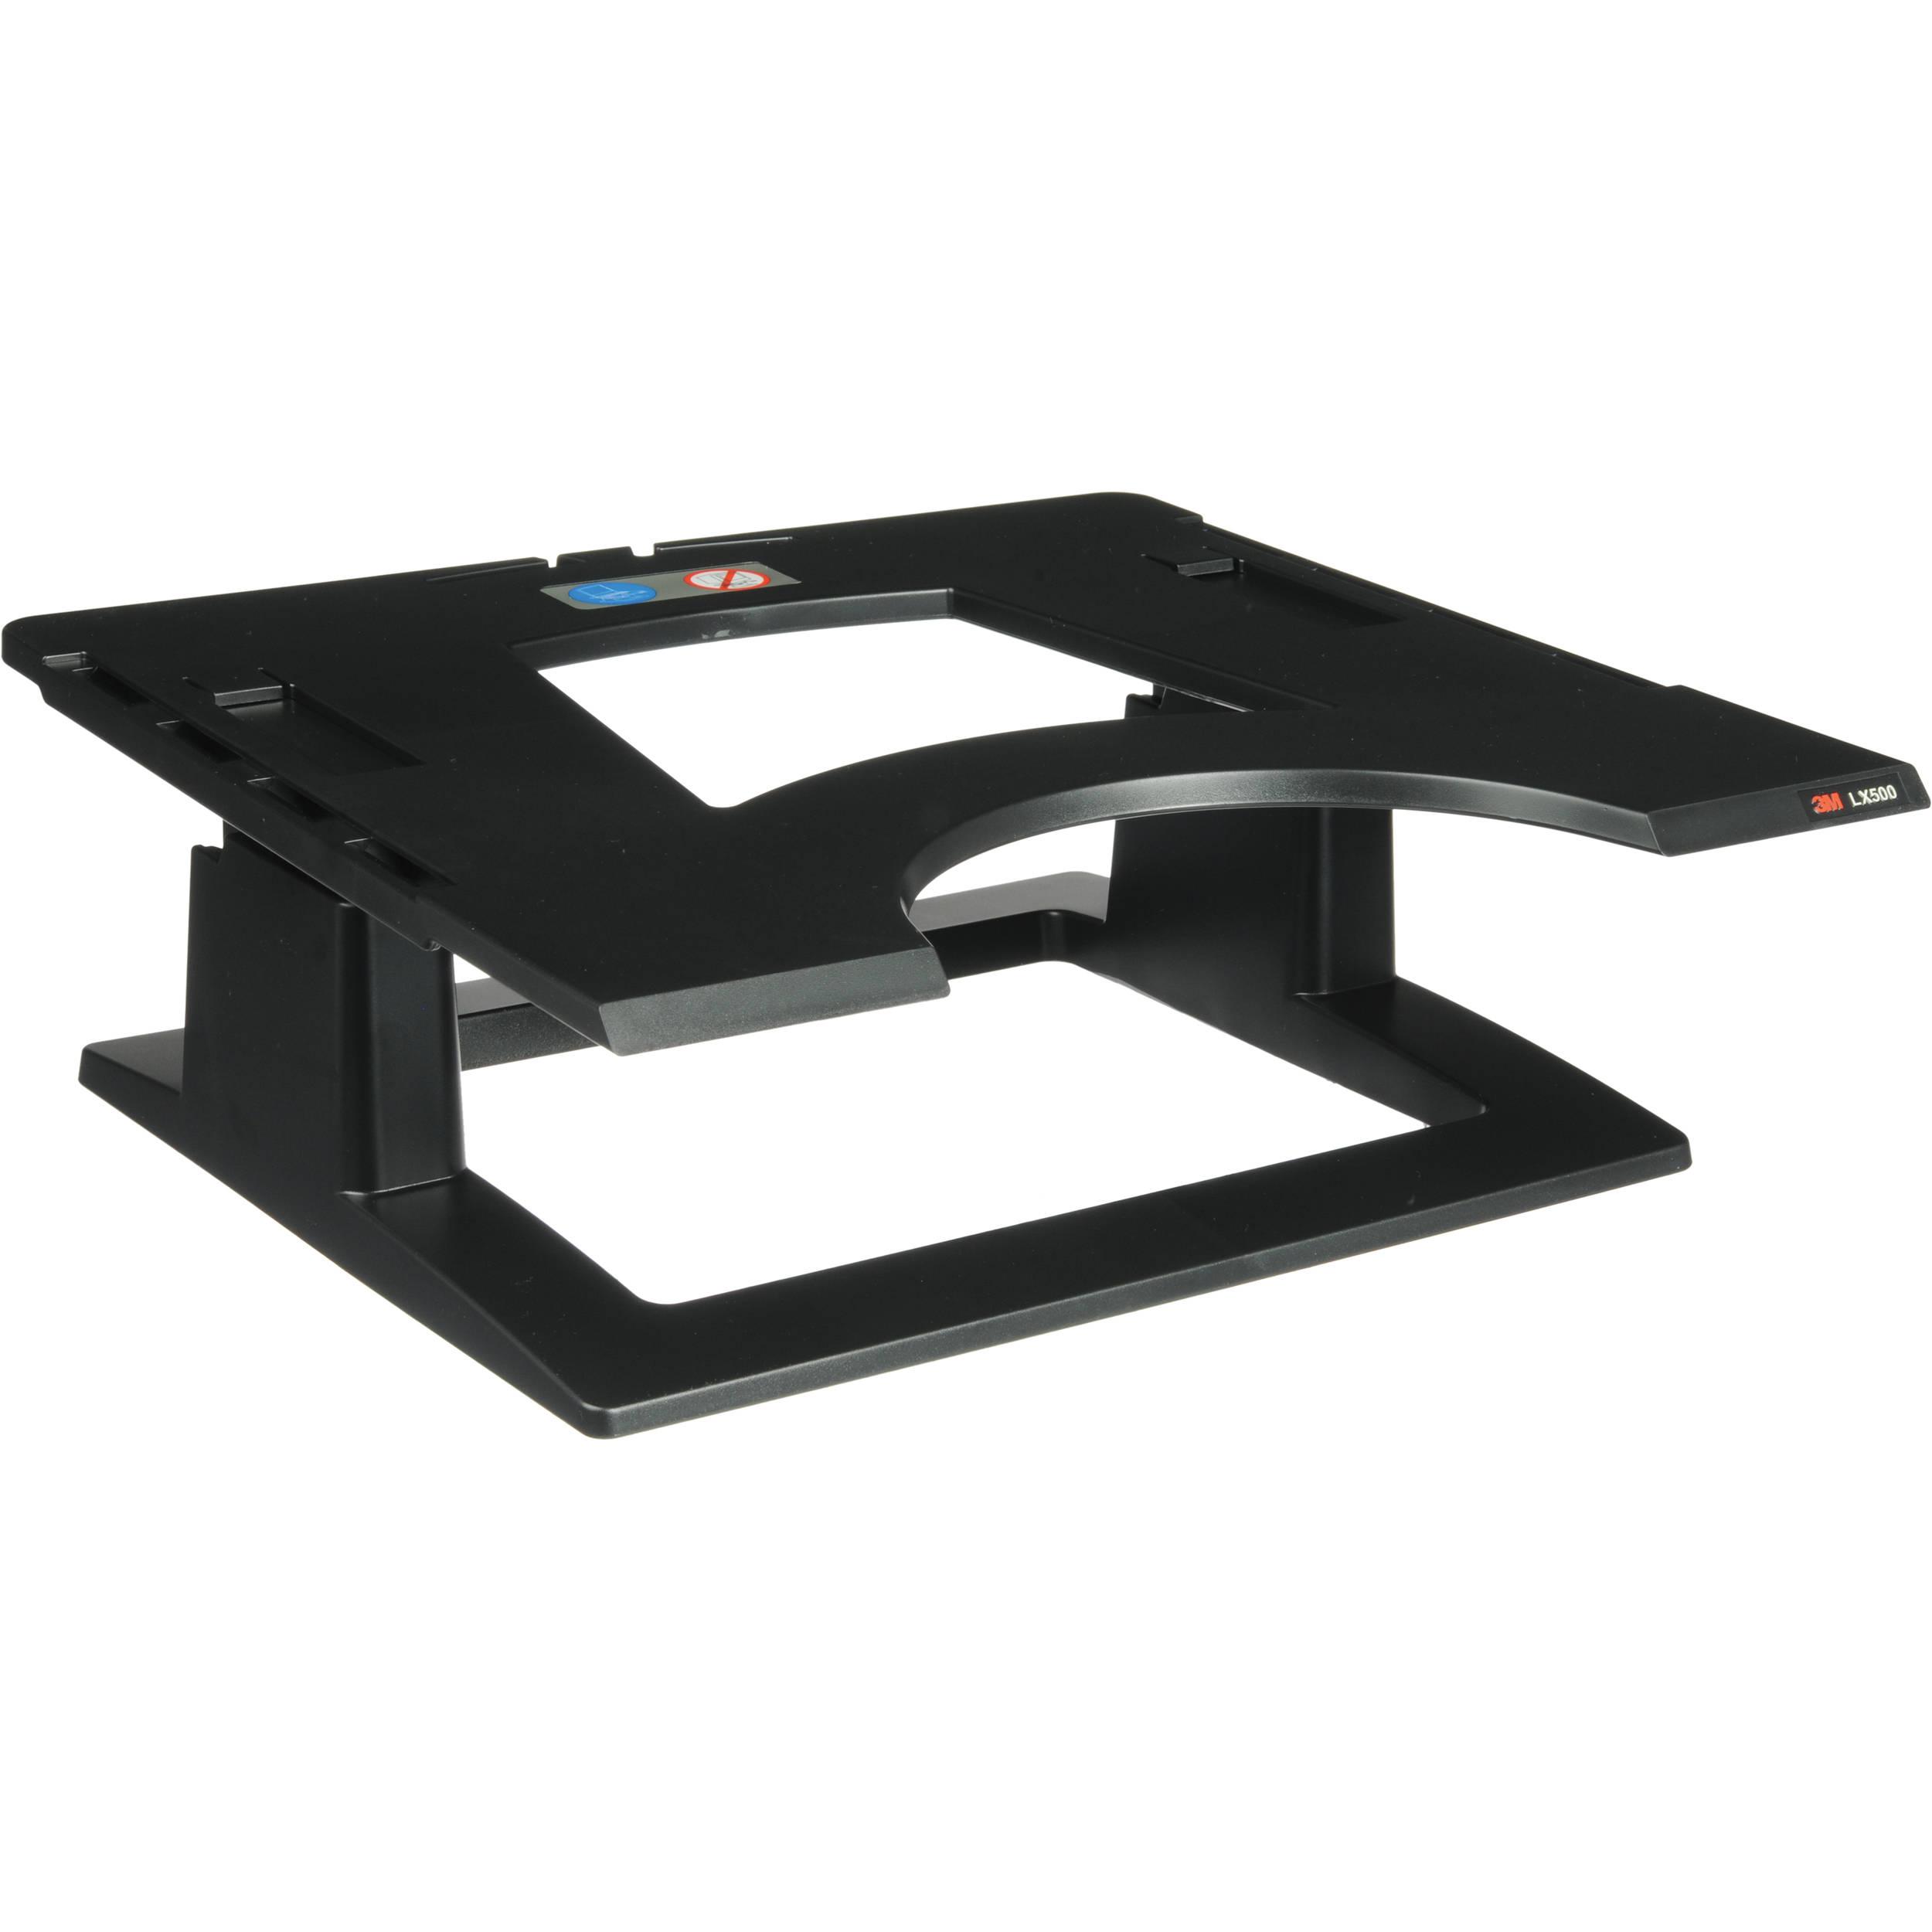 3m Lx500 Adjustable Notebook Riser Black Lx500 B Amp H Photo